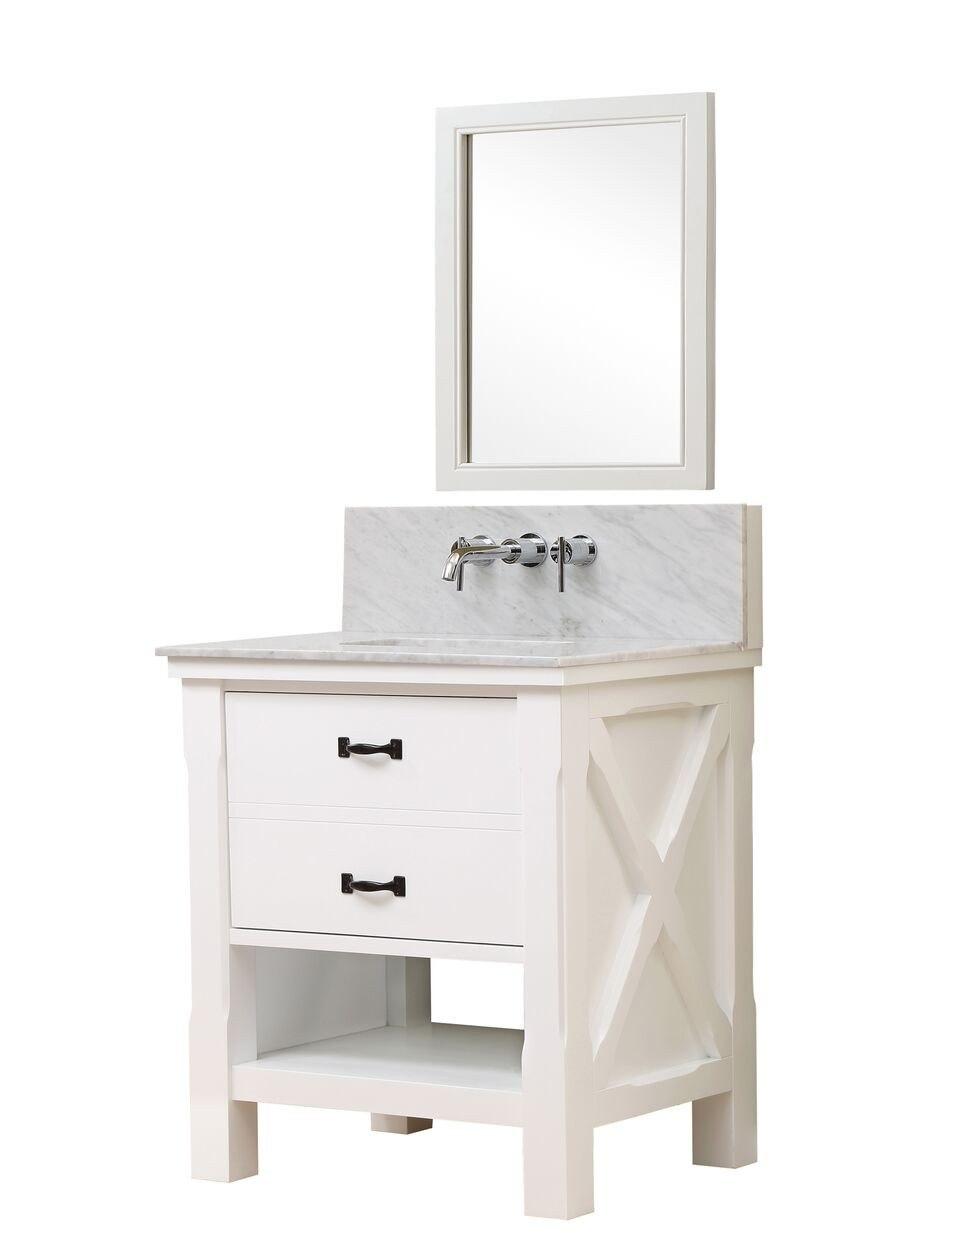 Direct Vanity Sink 32S1-WWC-WM Xtraordinary Spa Premium 32 Inch White vanity with Carrera White Marble Top